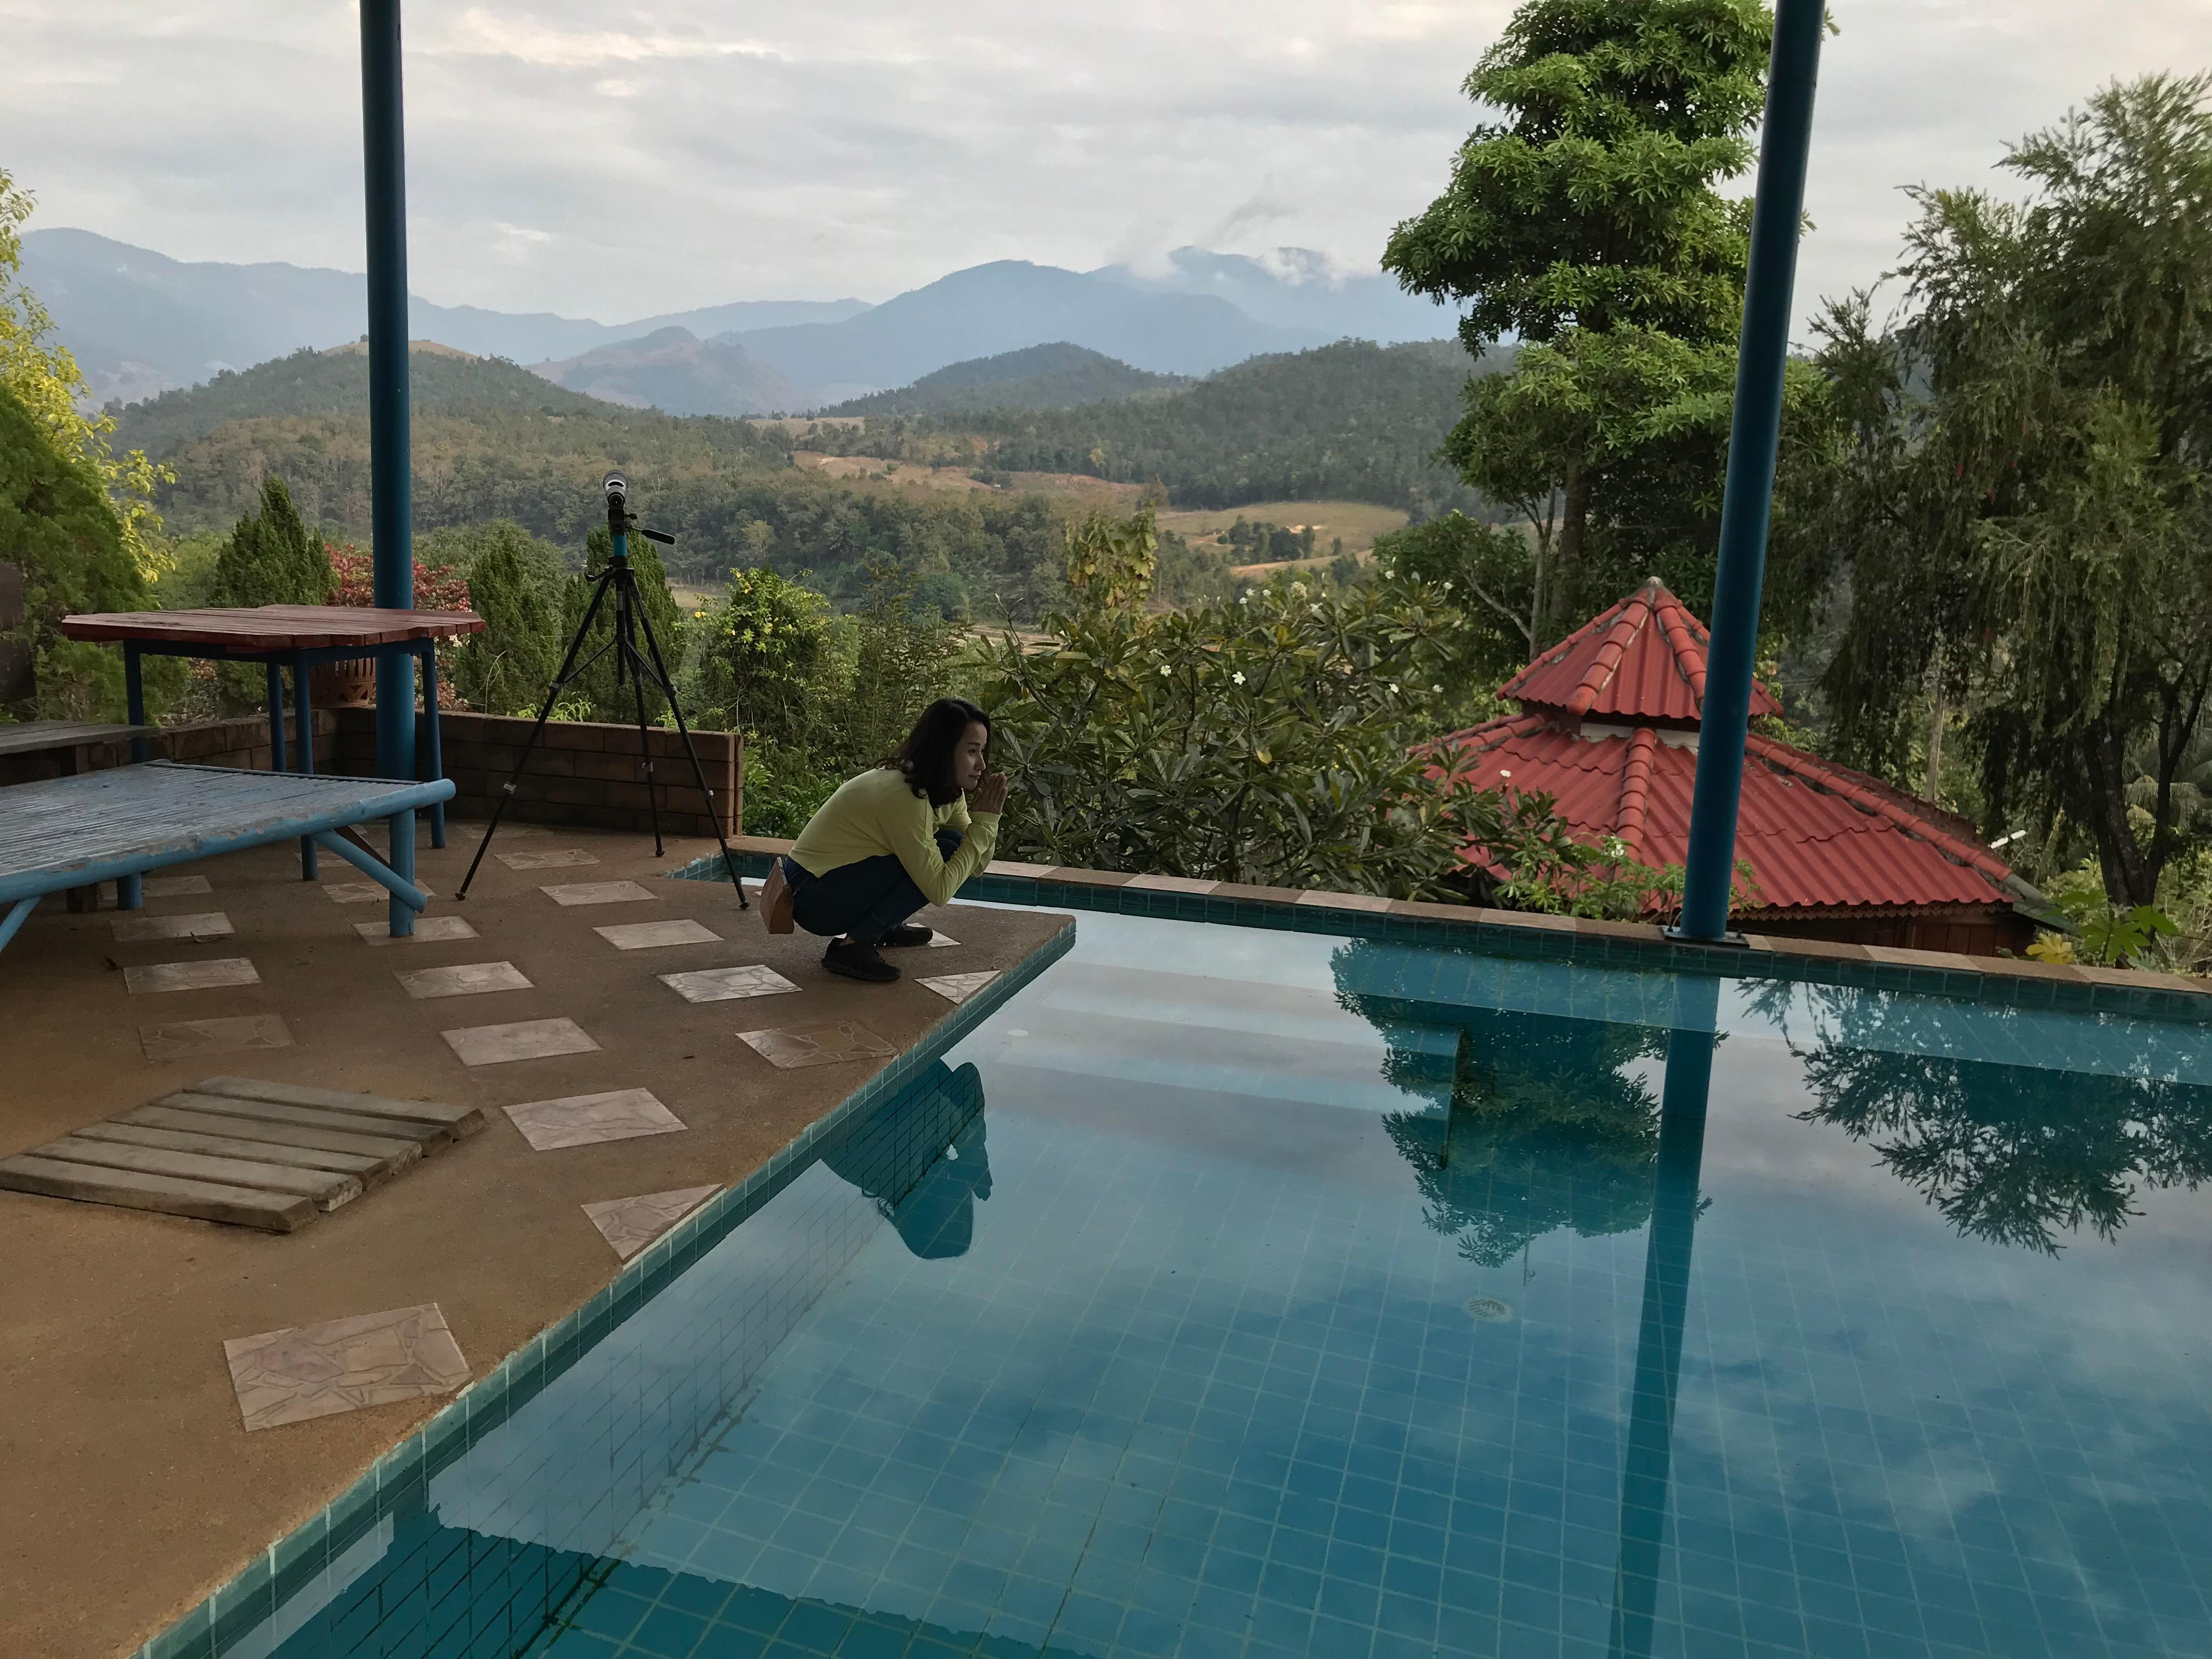 Navasoung Resort 2017 Room Prices Deals Reviews Expedia